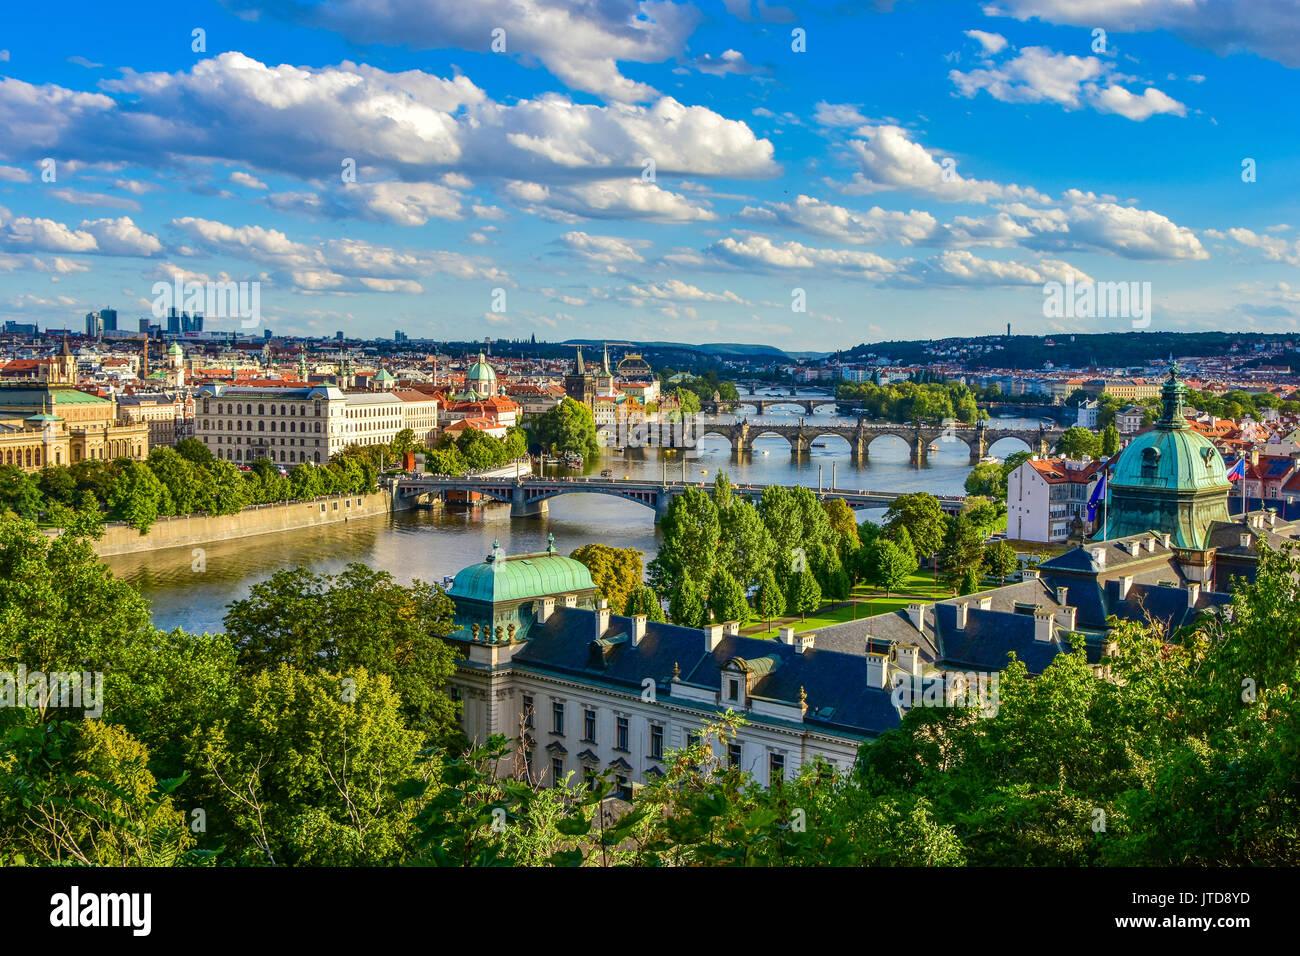 Charles Bridge and other bridges across the Vltava River in Prague, Czech Republic - Stock Image